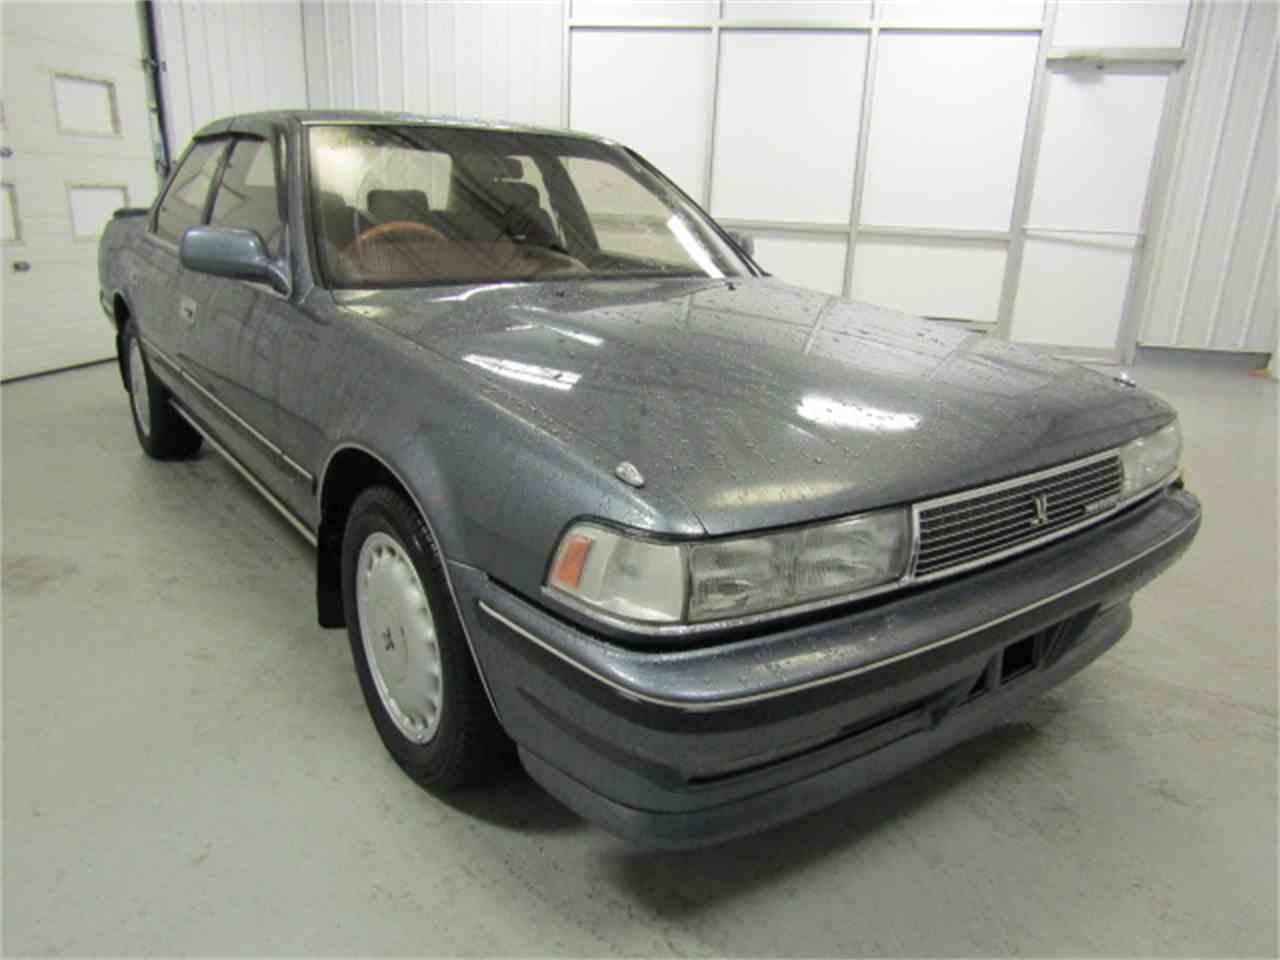 1988 Toyota Cresta for Sale - CC-945996